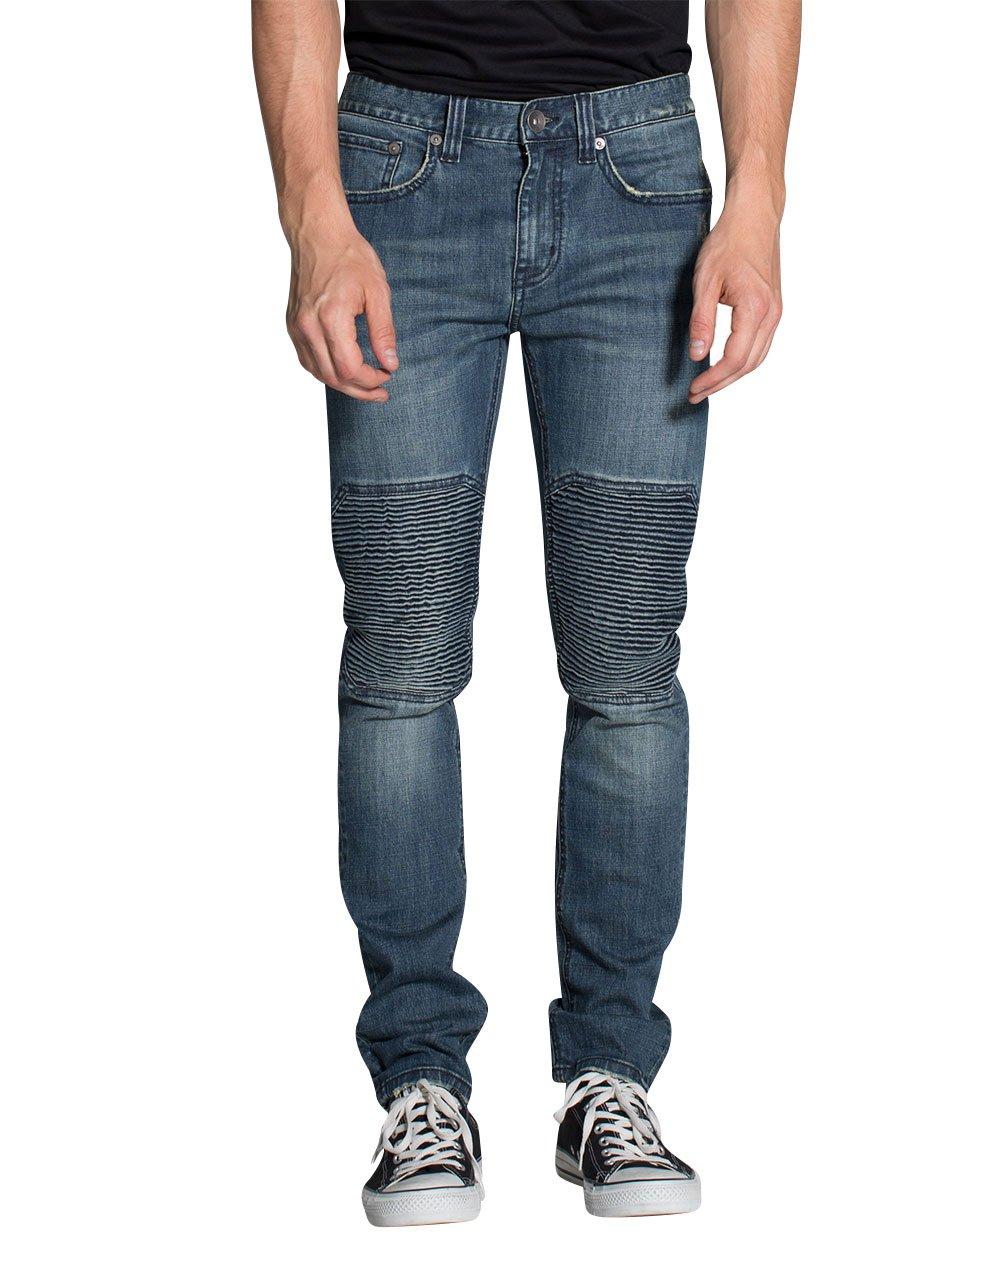 Rsq London Moto Skinny Jeans, Medium Wash, 32X32